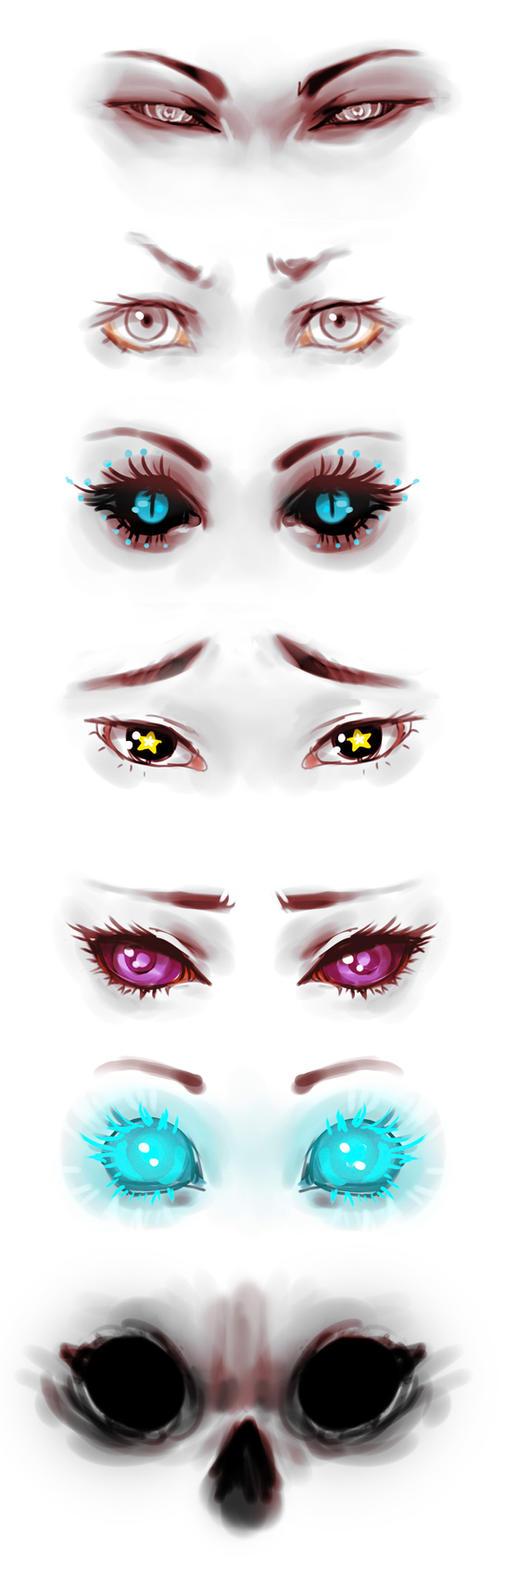 oc eyes reference by genki-de